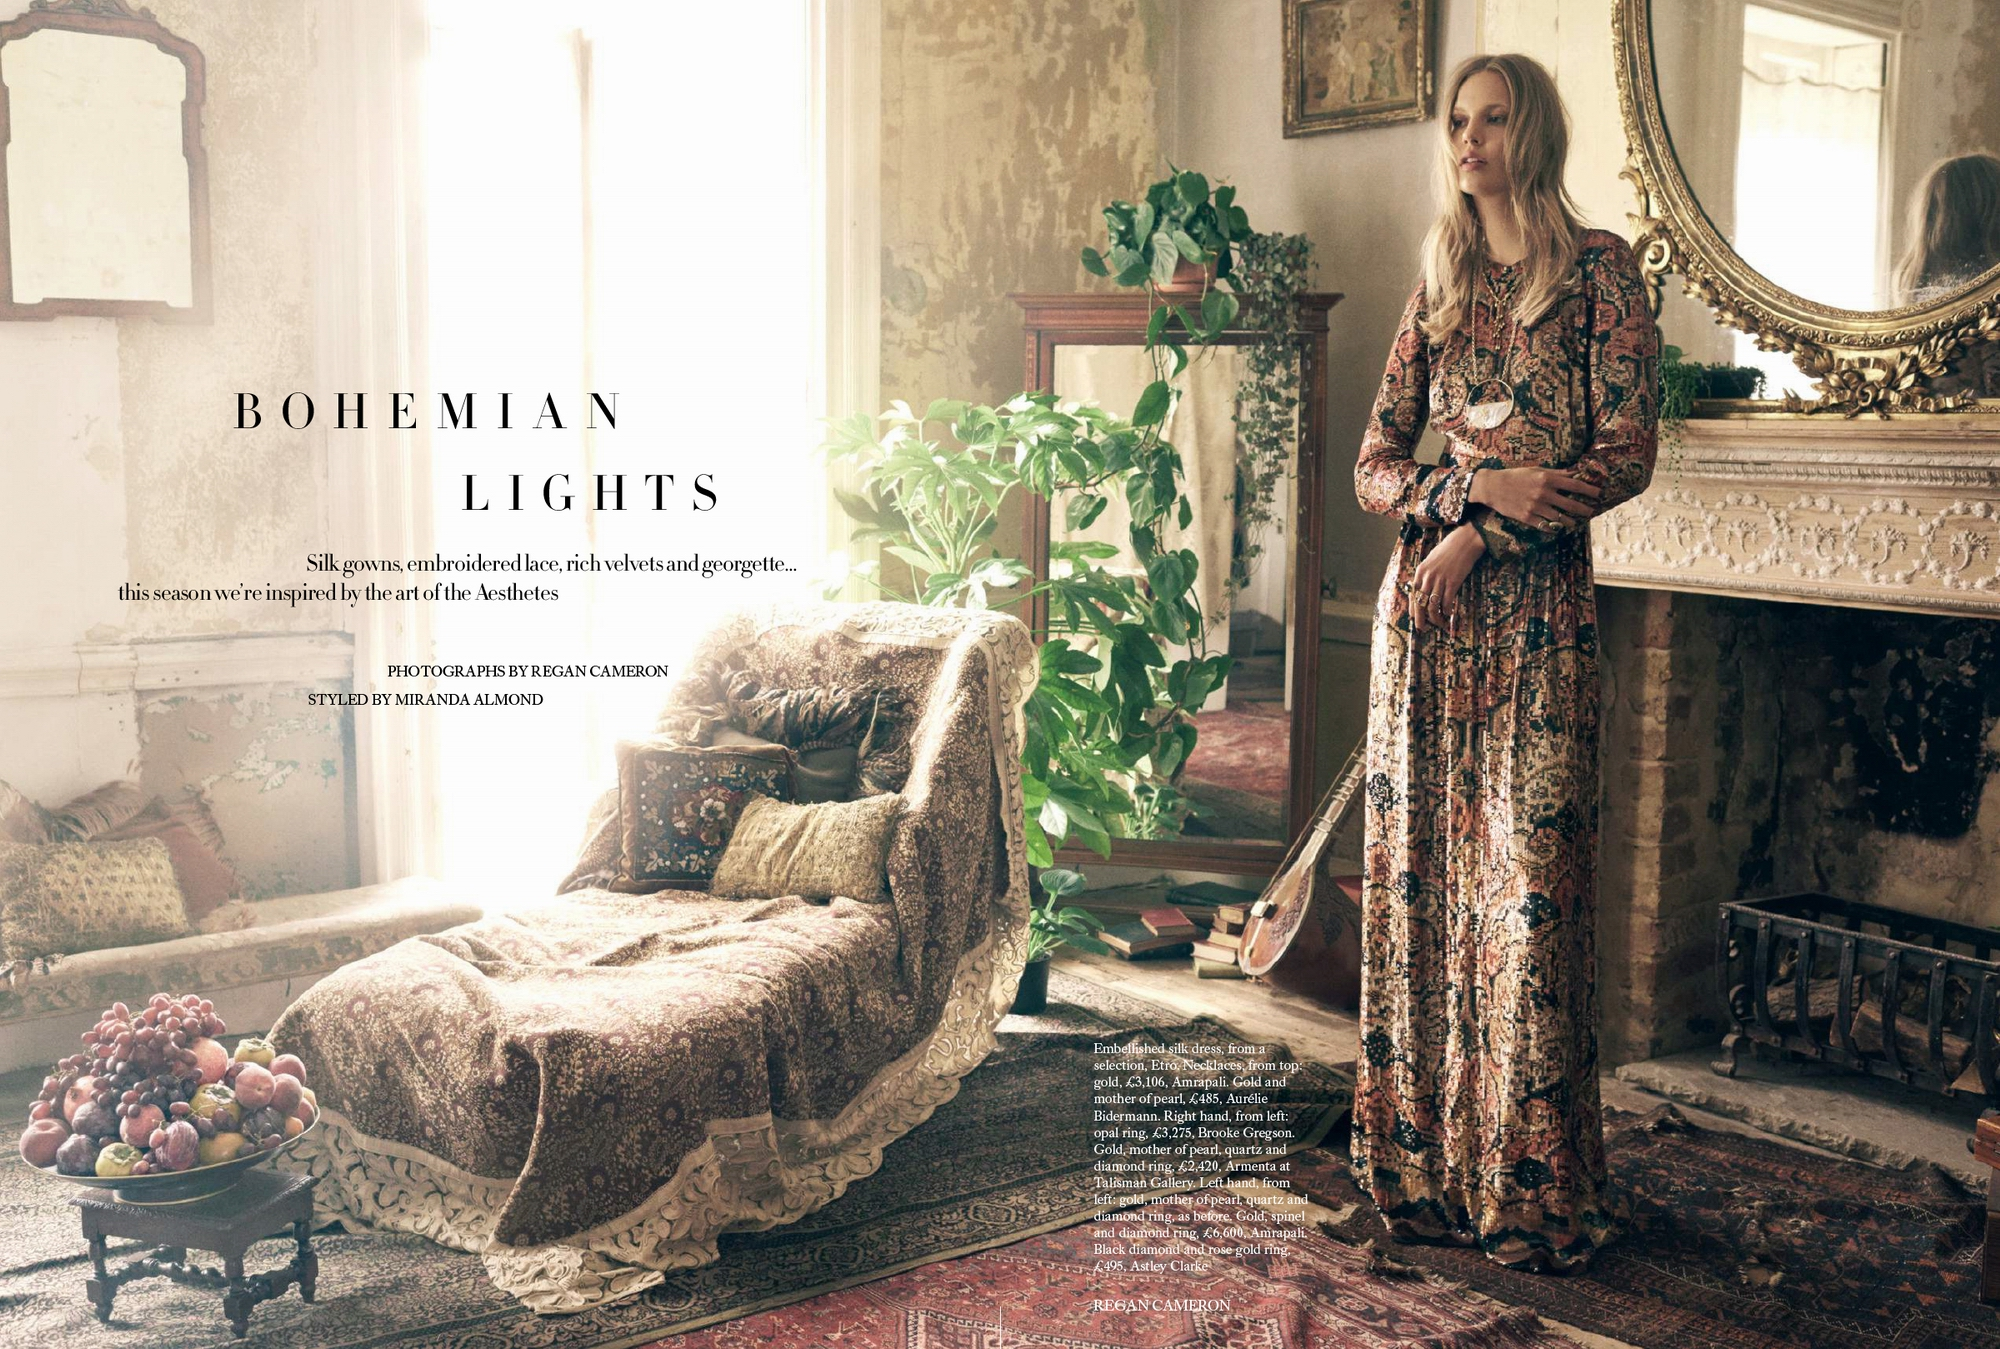 BOHEMIAN LIGHTS 1